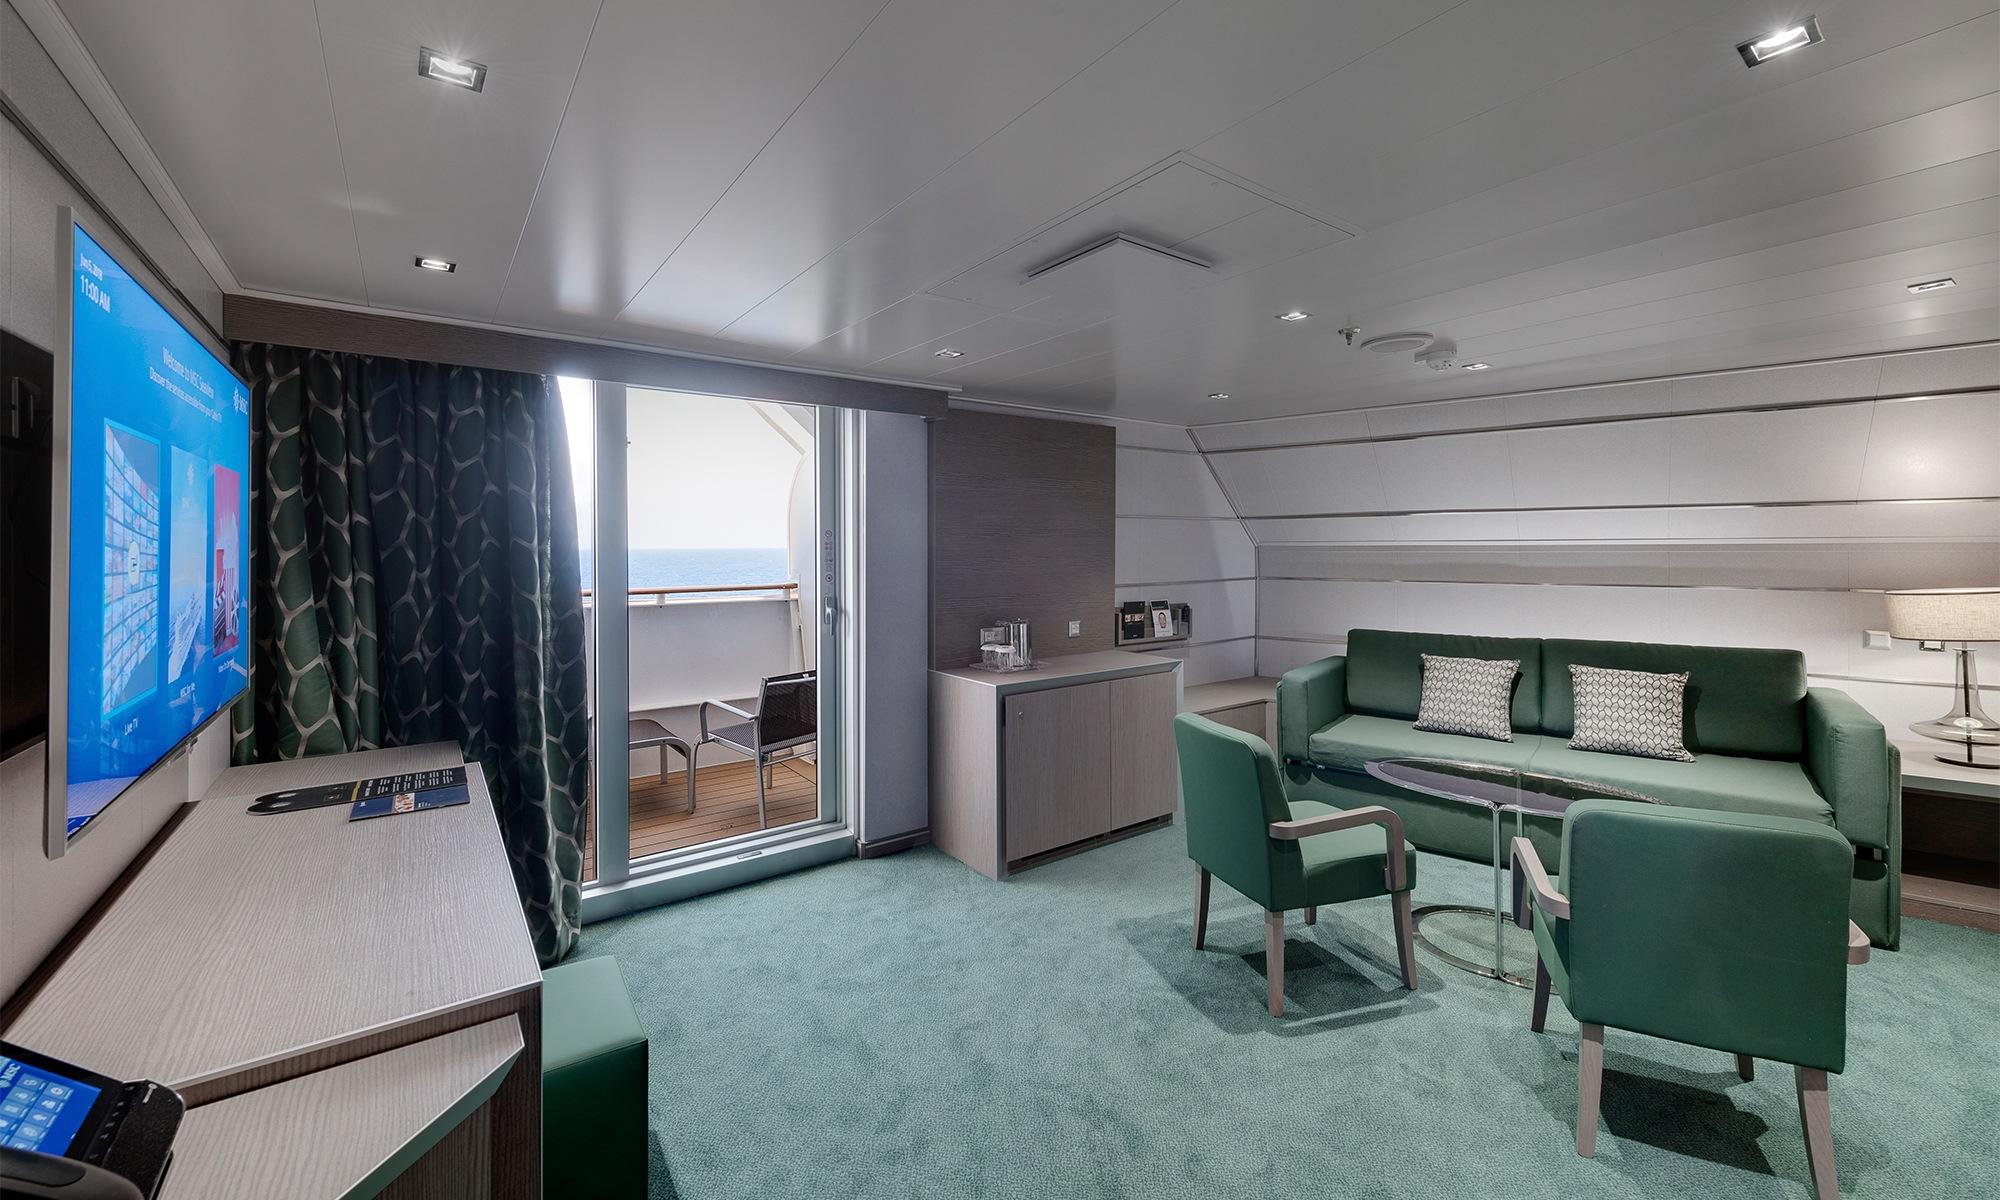 Msc Seaview Cruise Ship Reviews Amp Itineraries